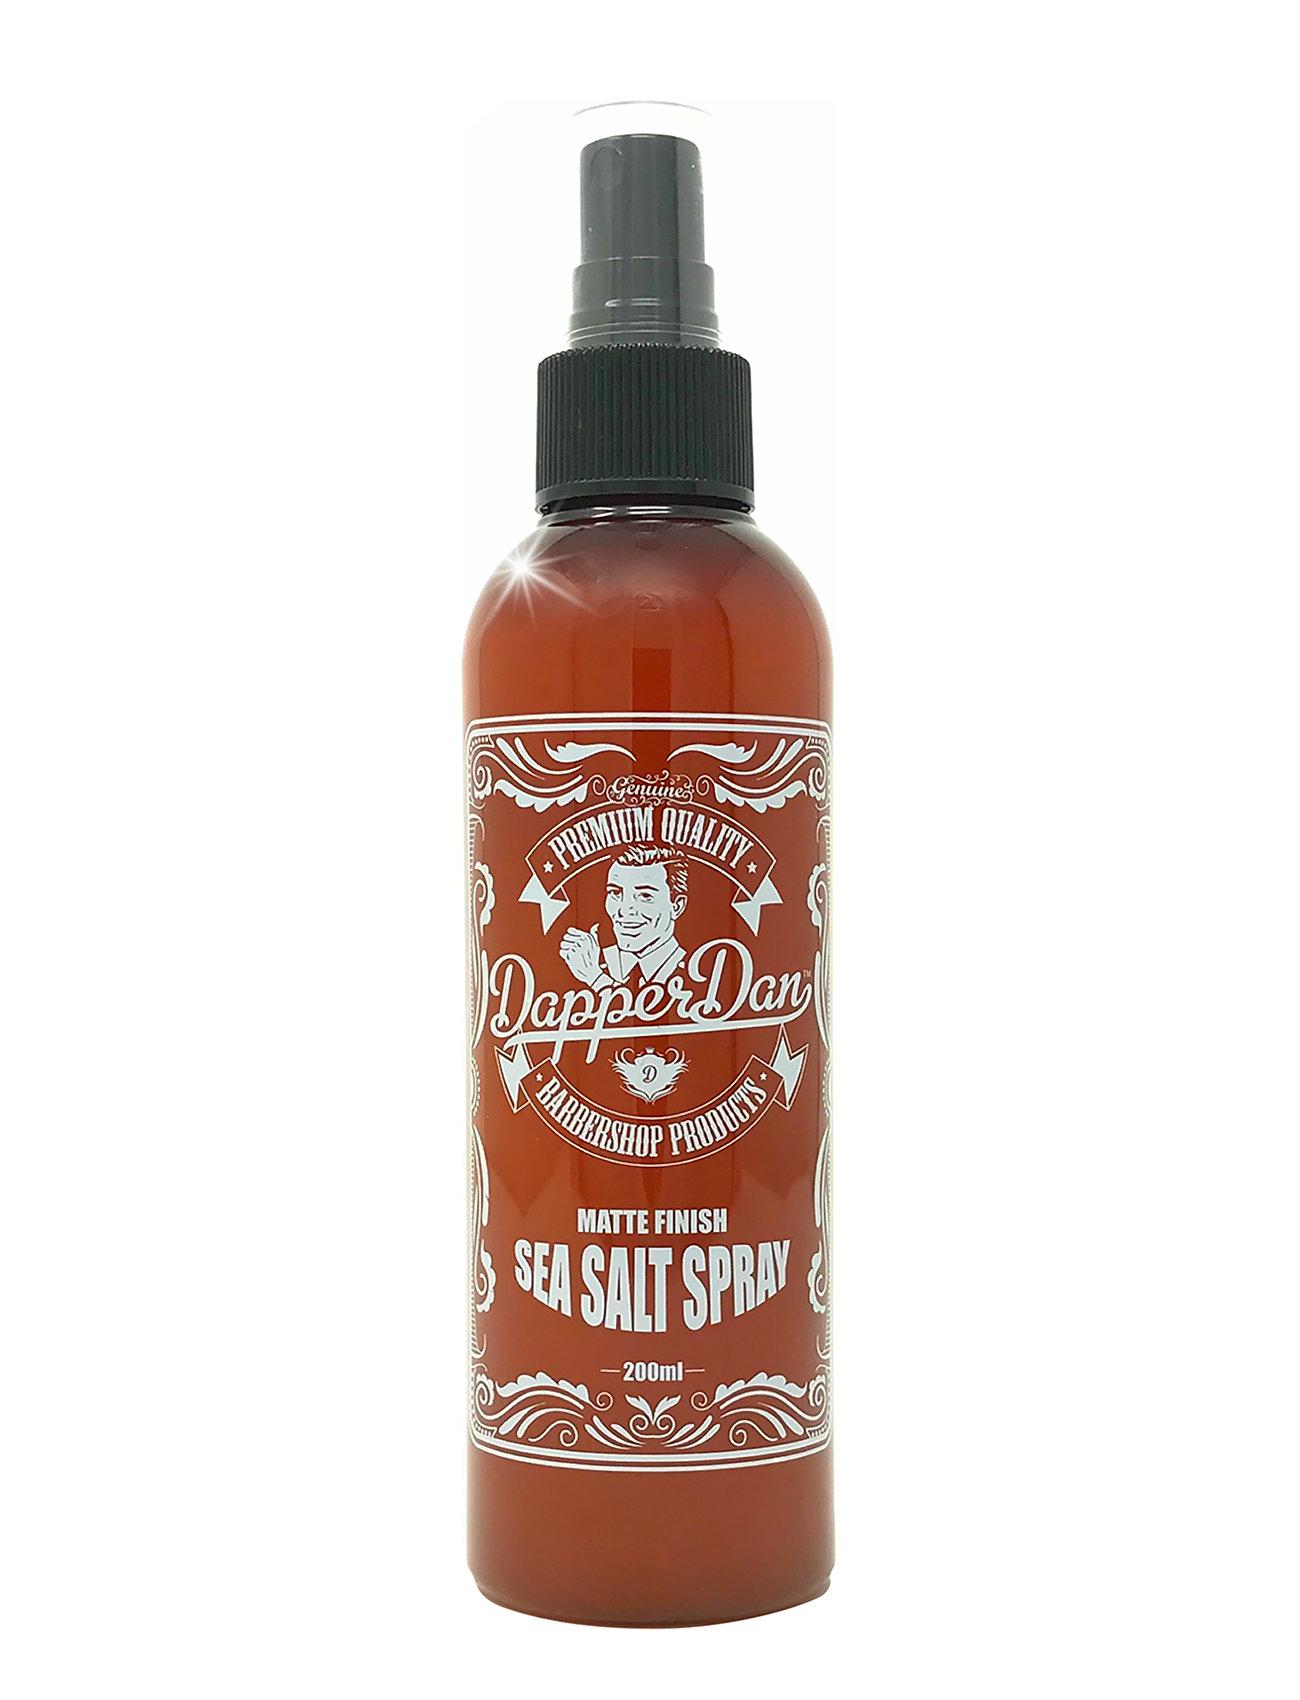 Sea Salt Spray - Dapper Dan